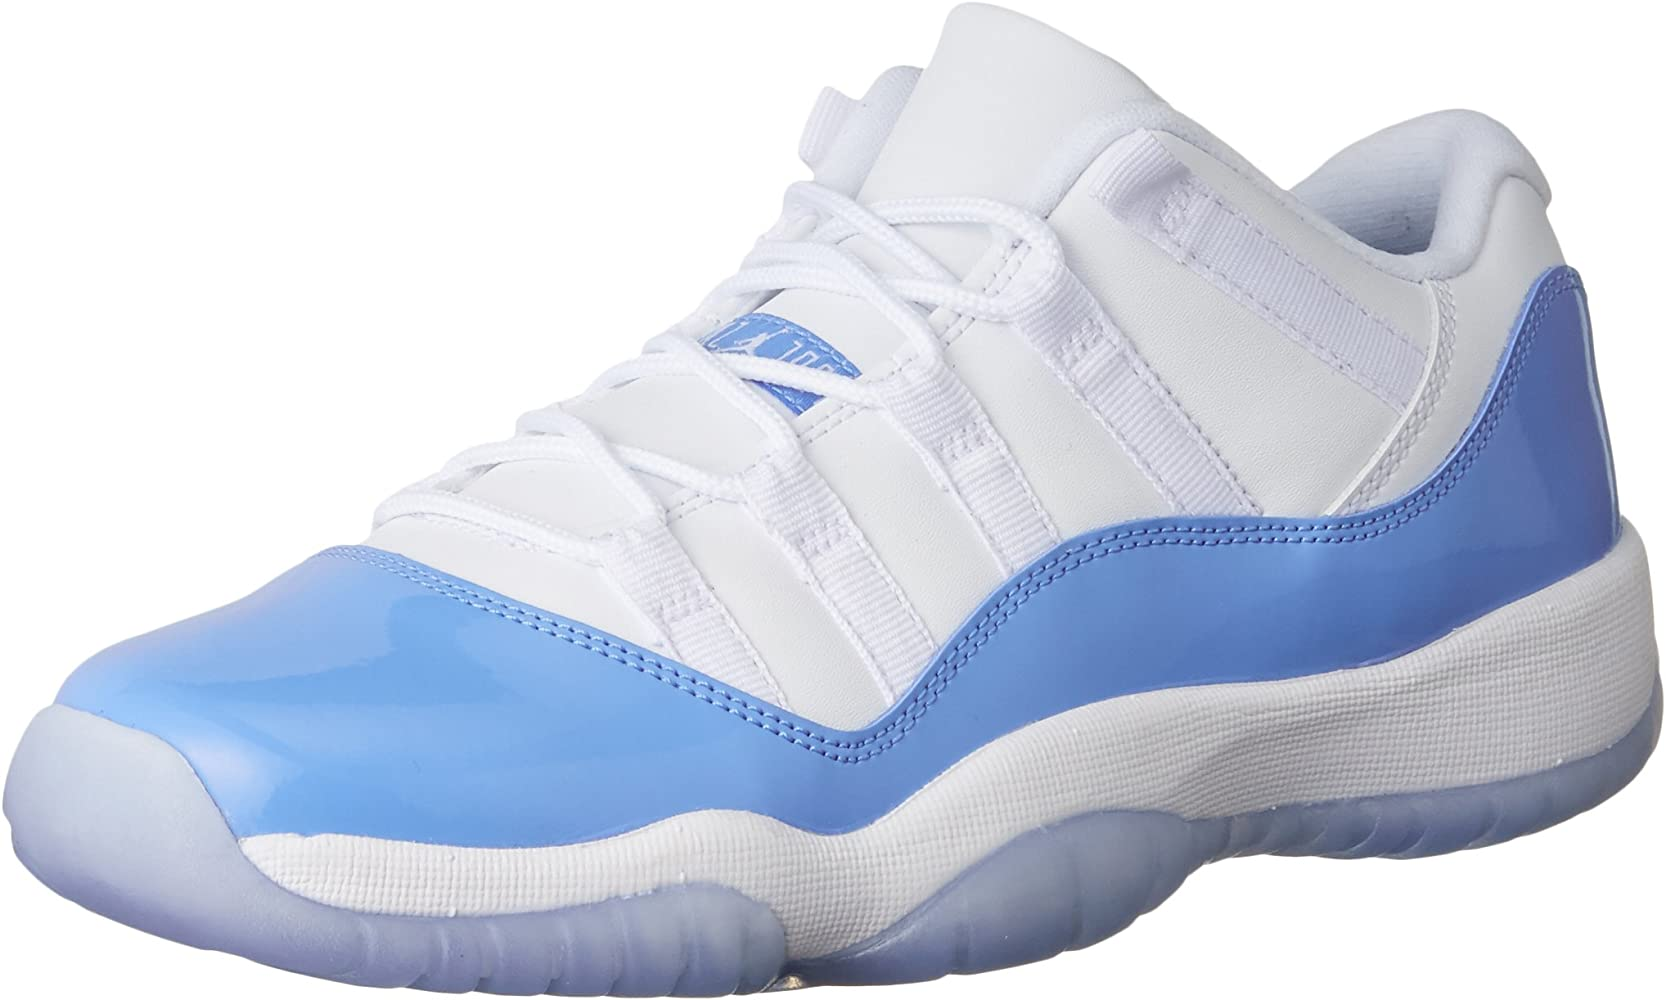 Jordan Retro 11 Low University Blue